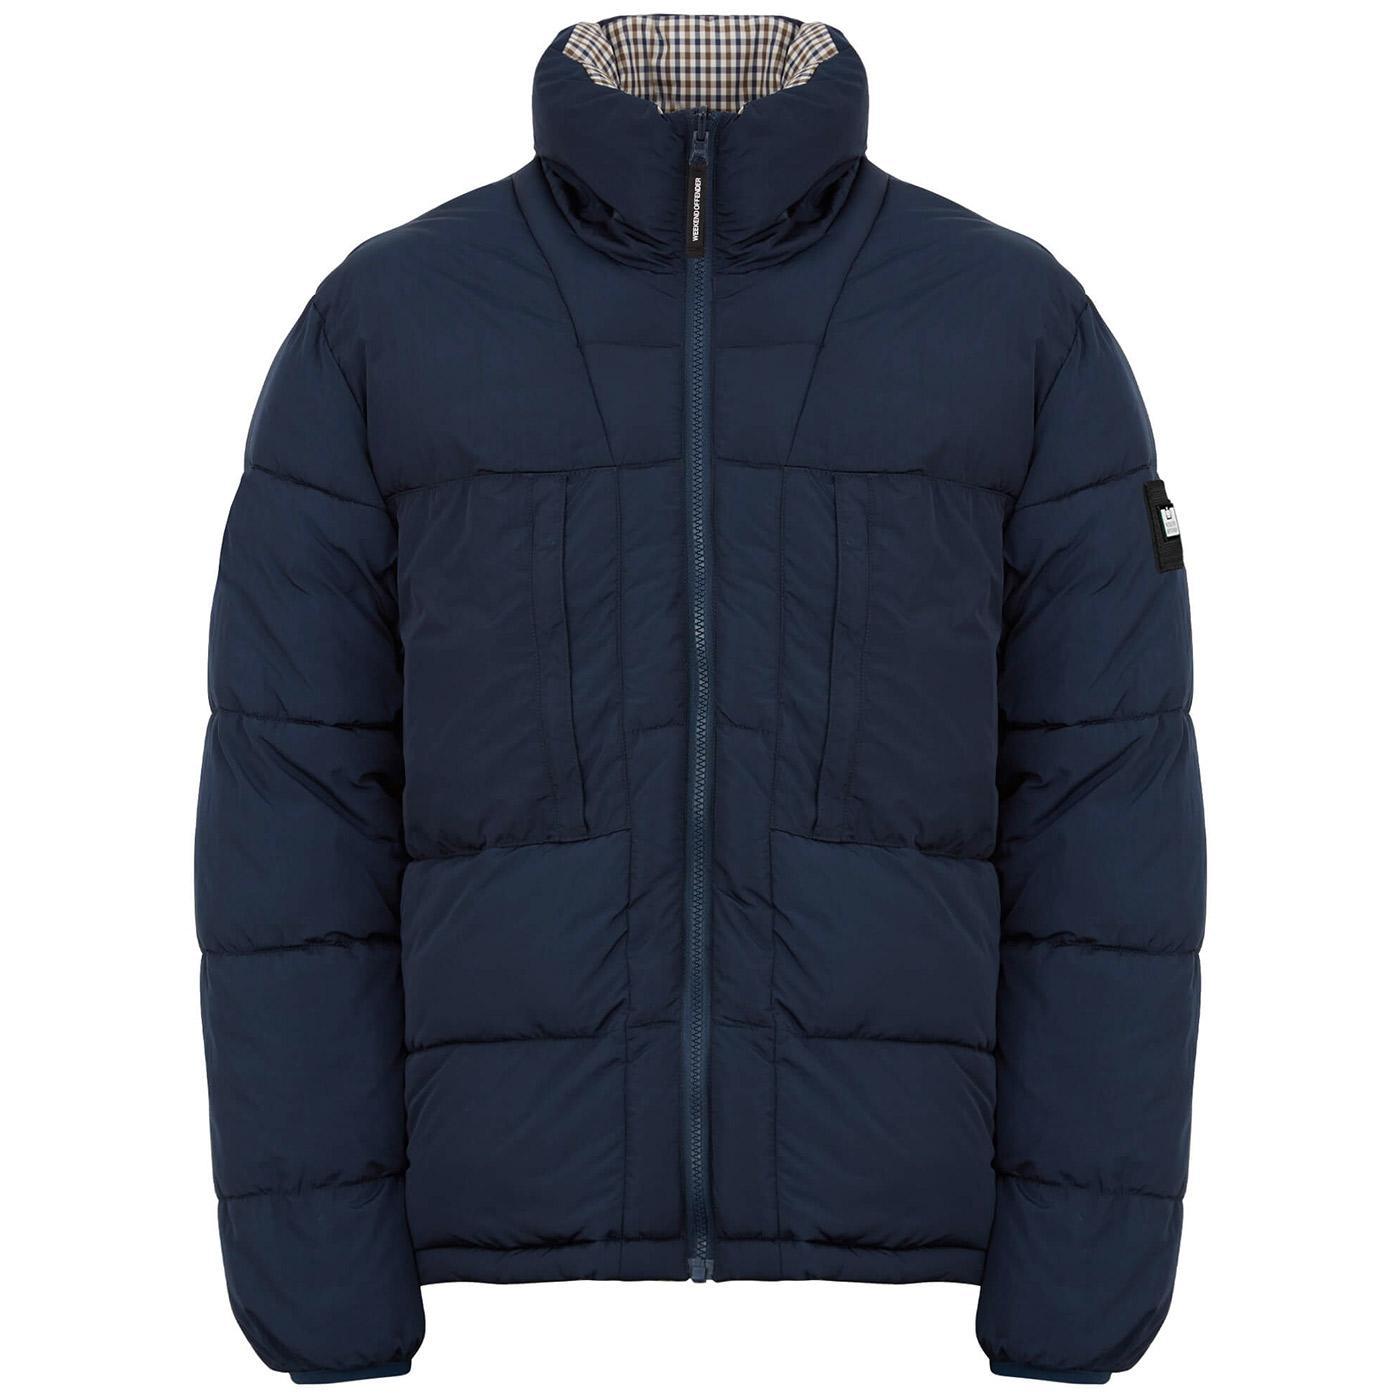 Holloway WEEKEND OFFENDER Reversible Puffa Jacket